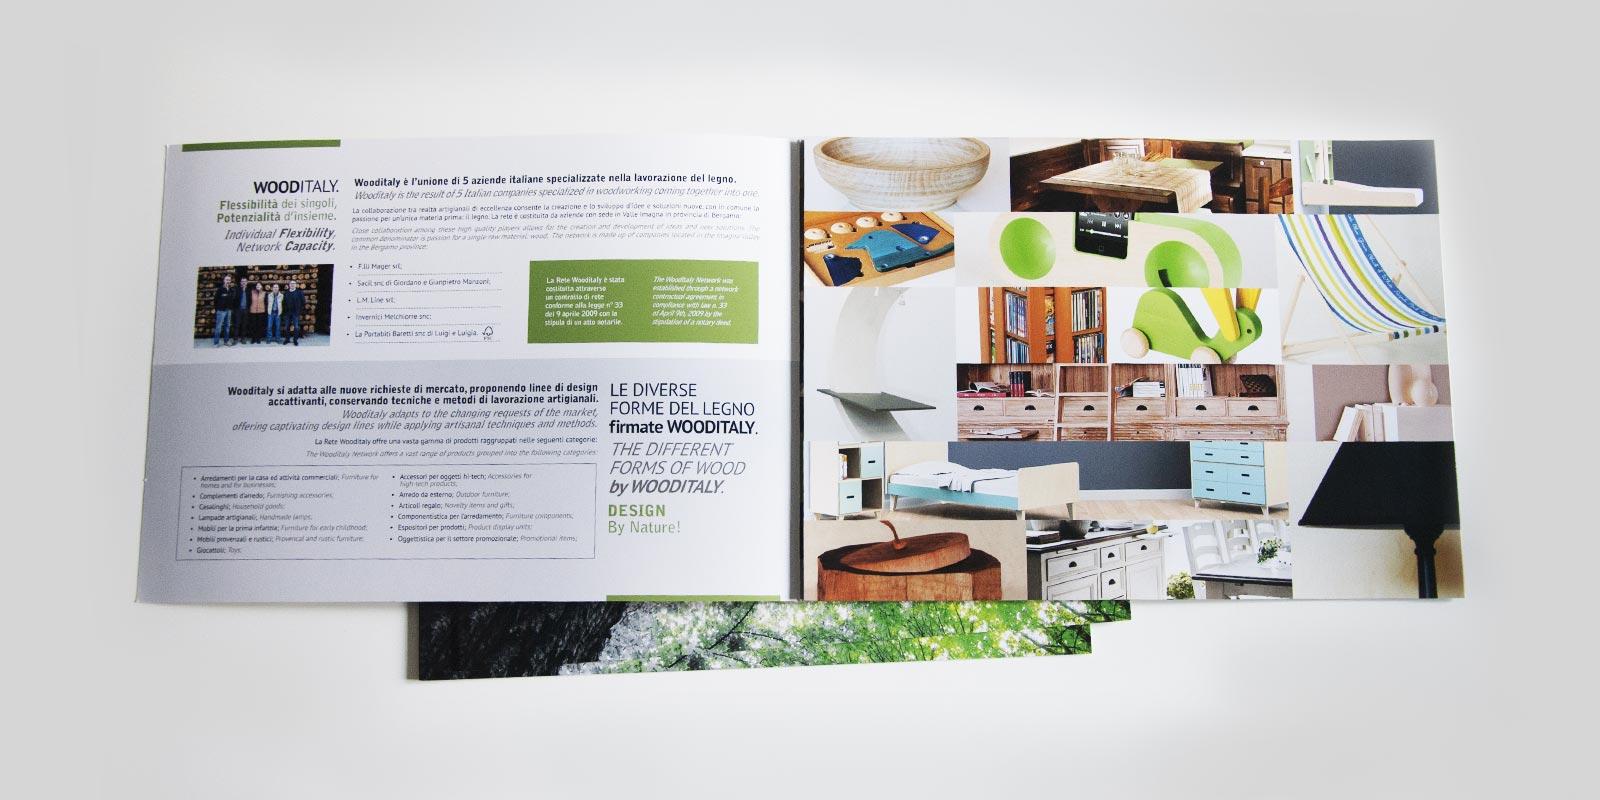 wooditaly - ellasdesign